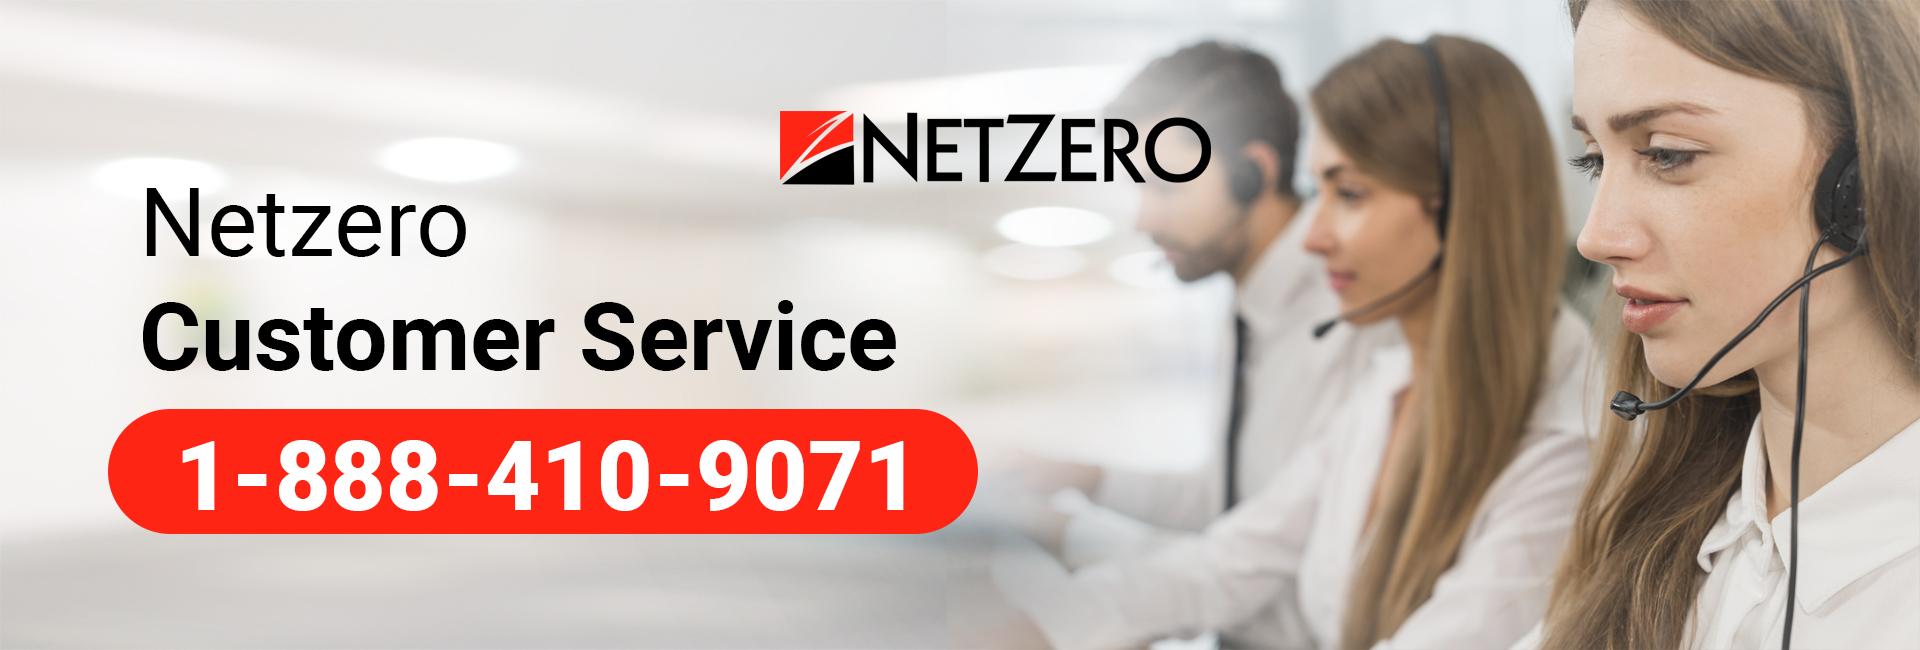 netzero customer service 1-888-410-9071